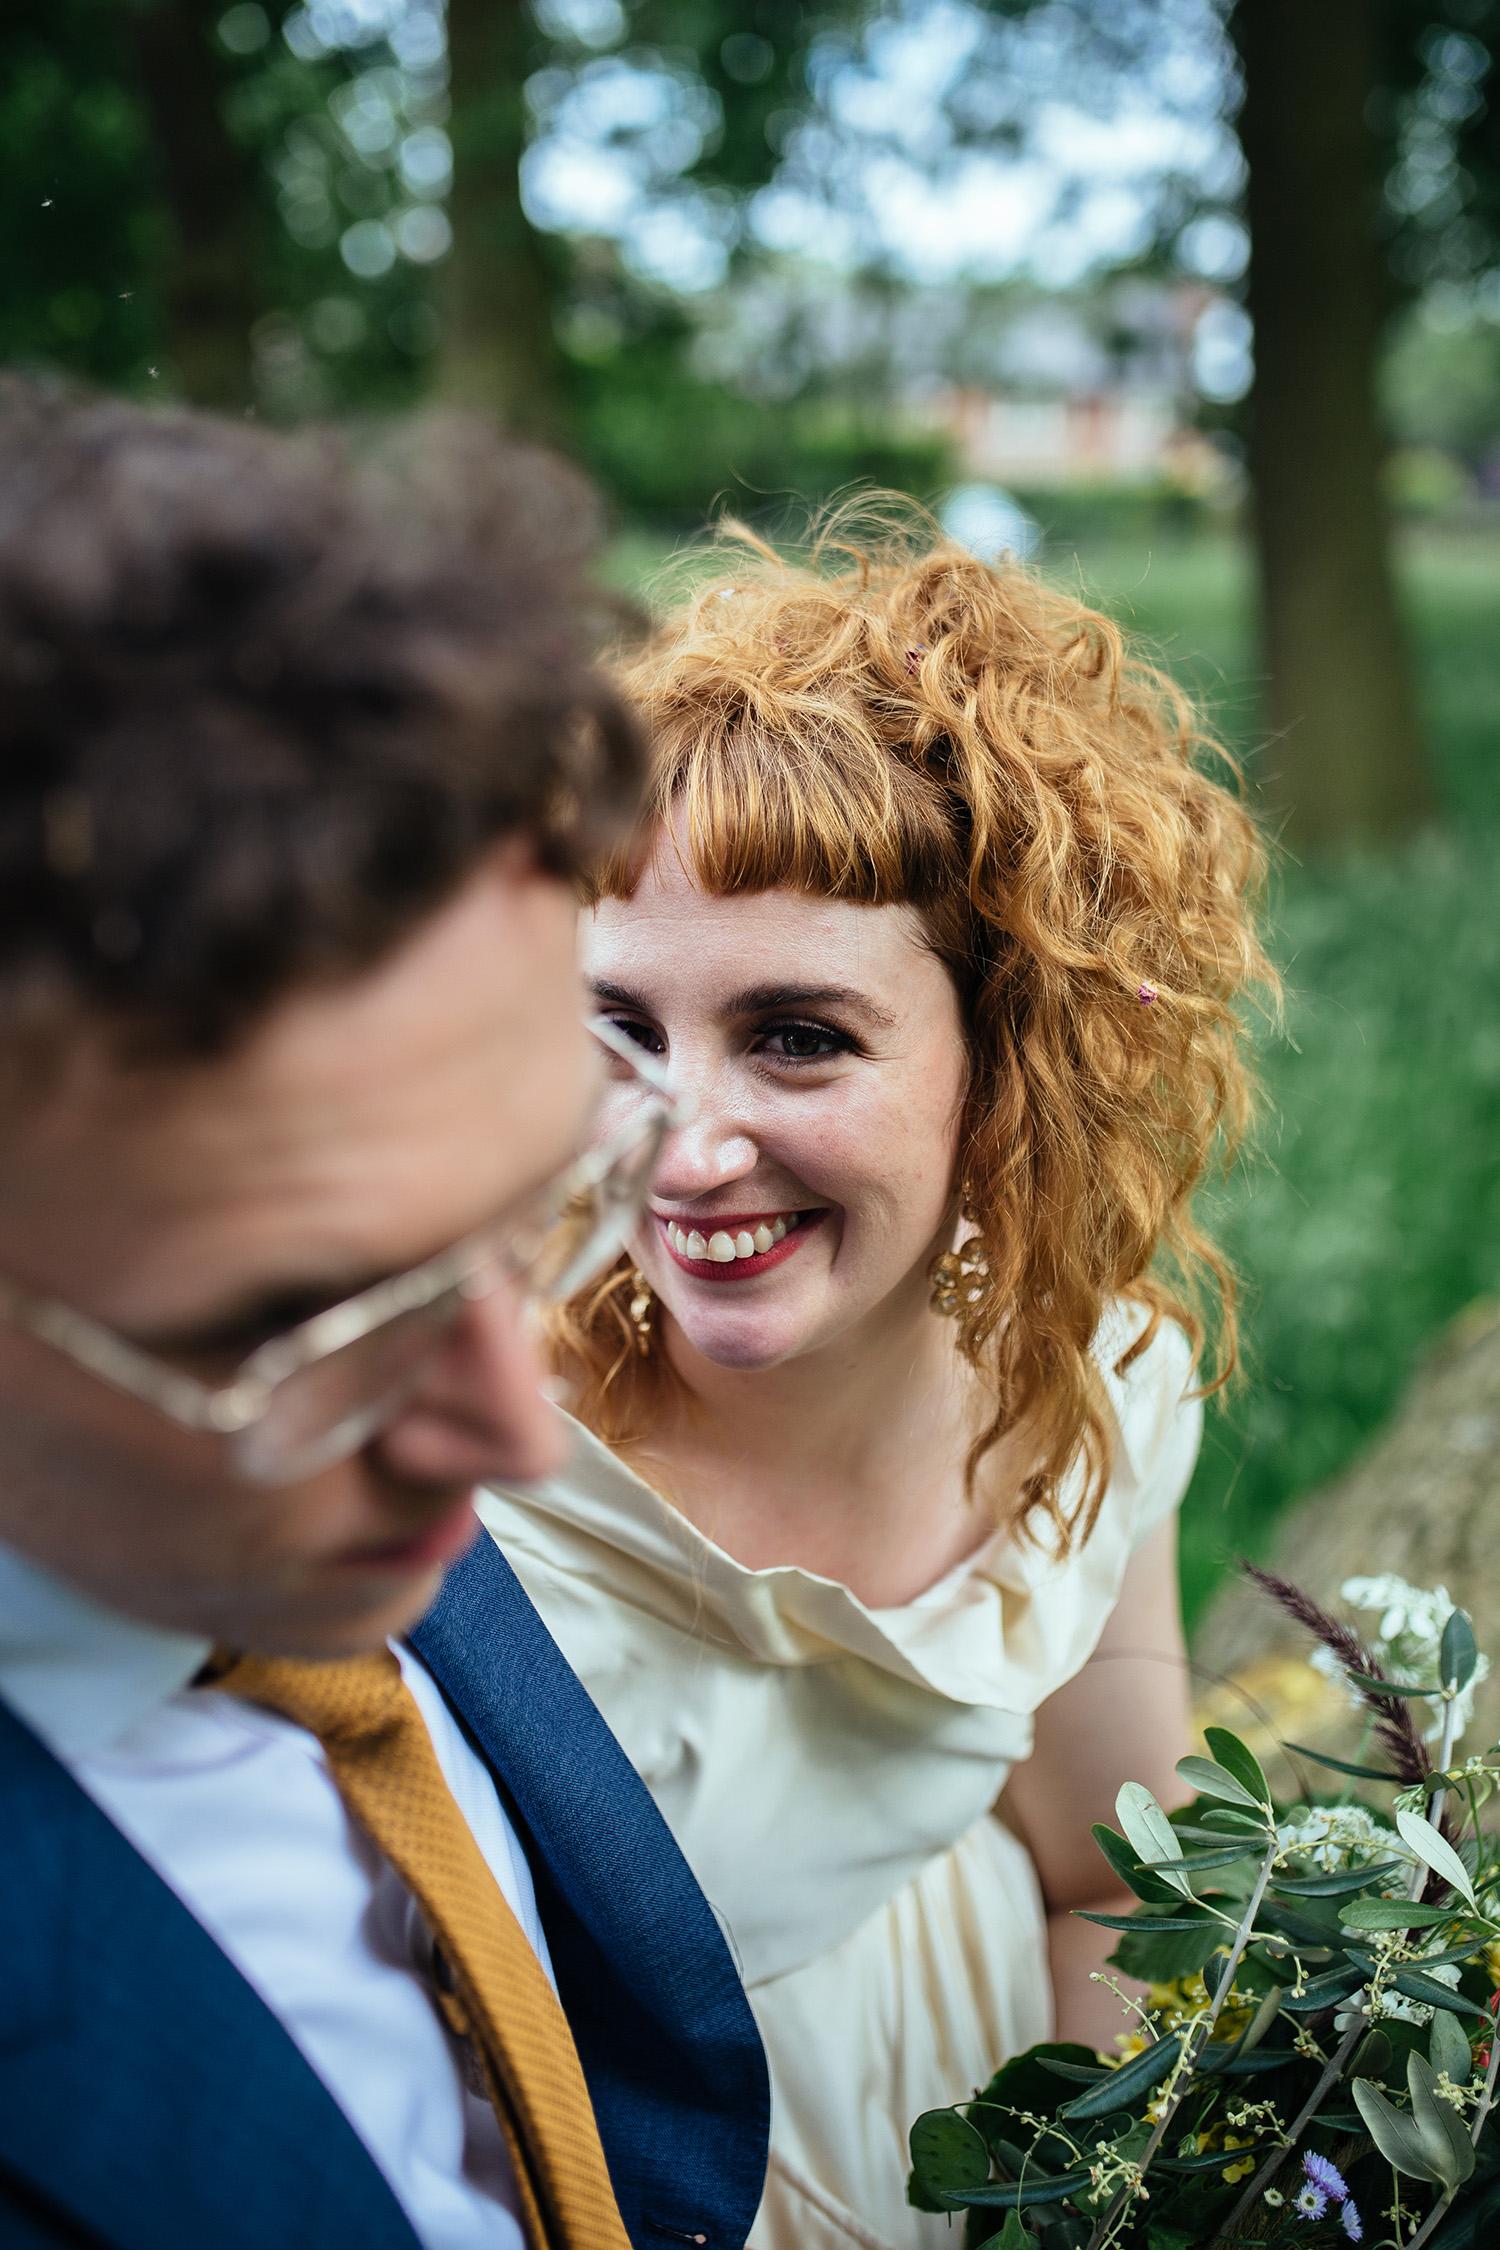 Manchester Wes Anderson Village Hall Wedding 104.jpg